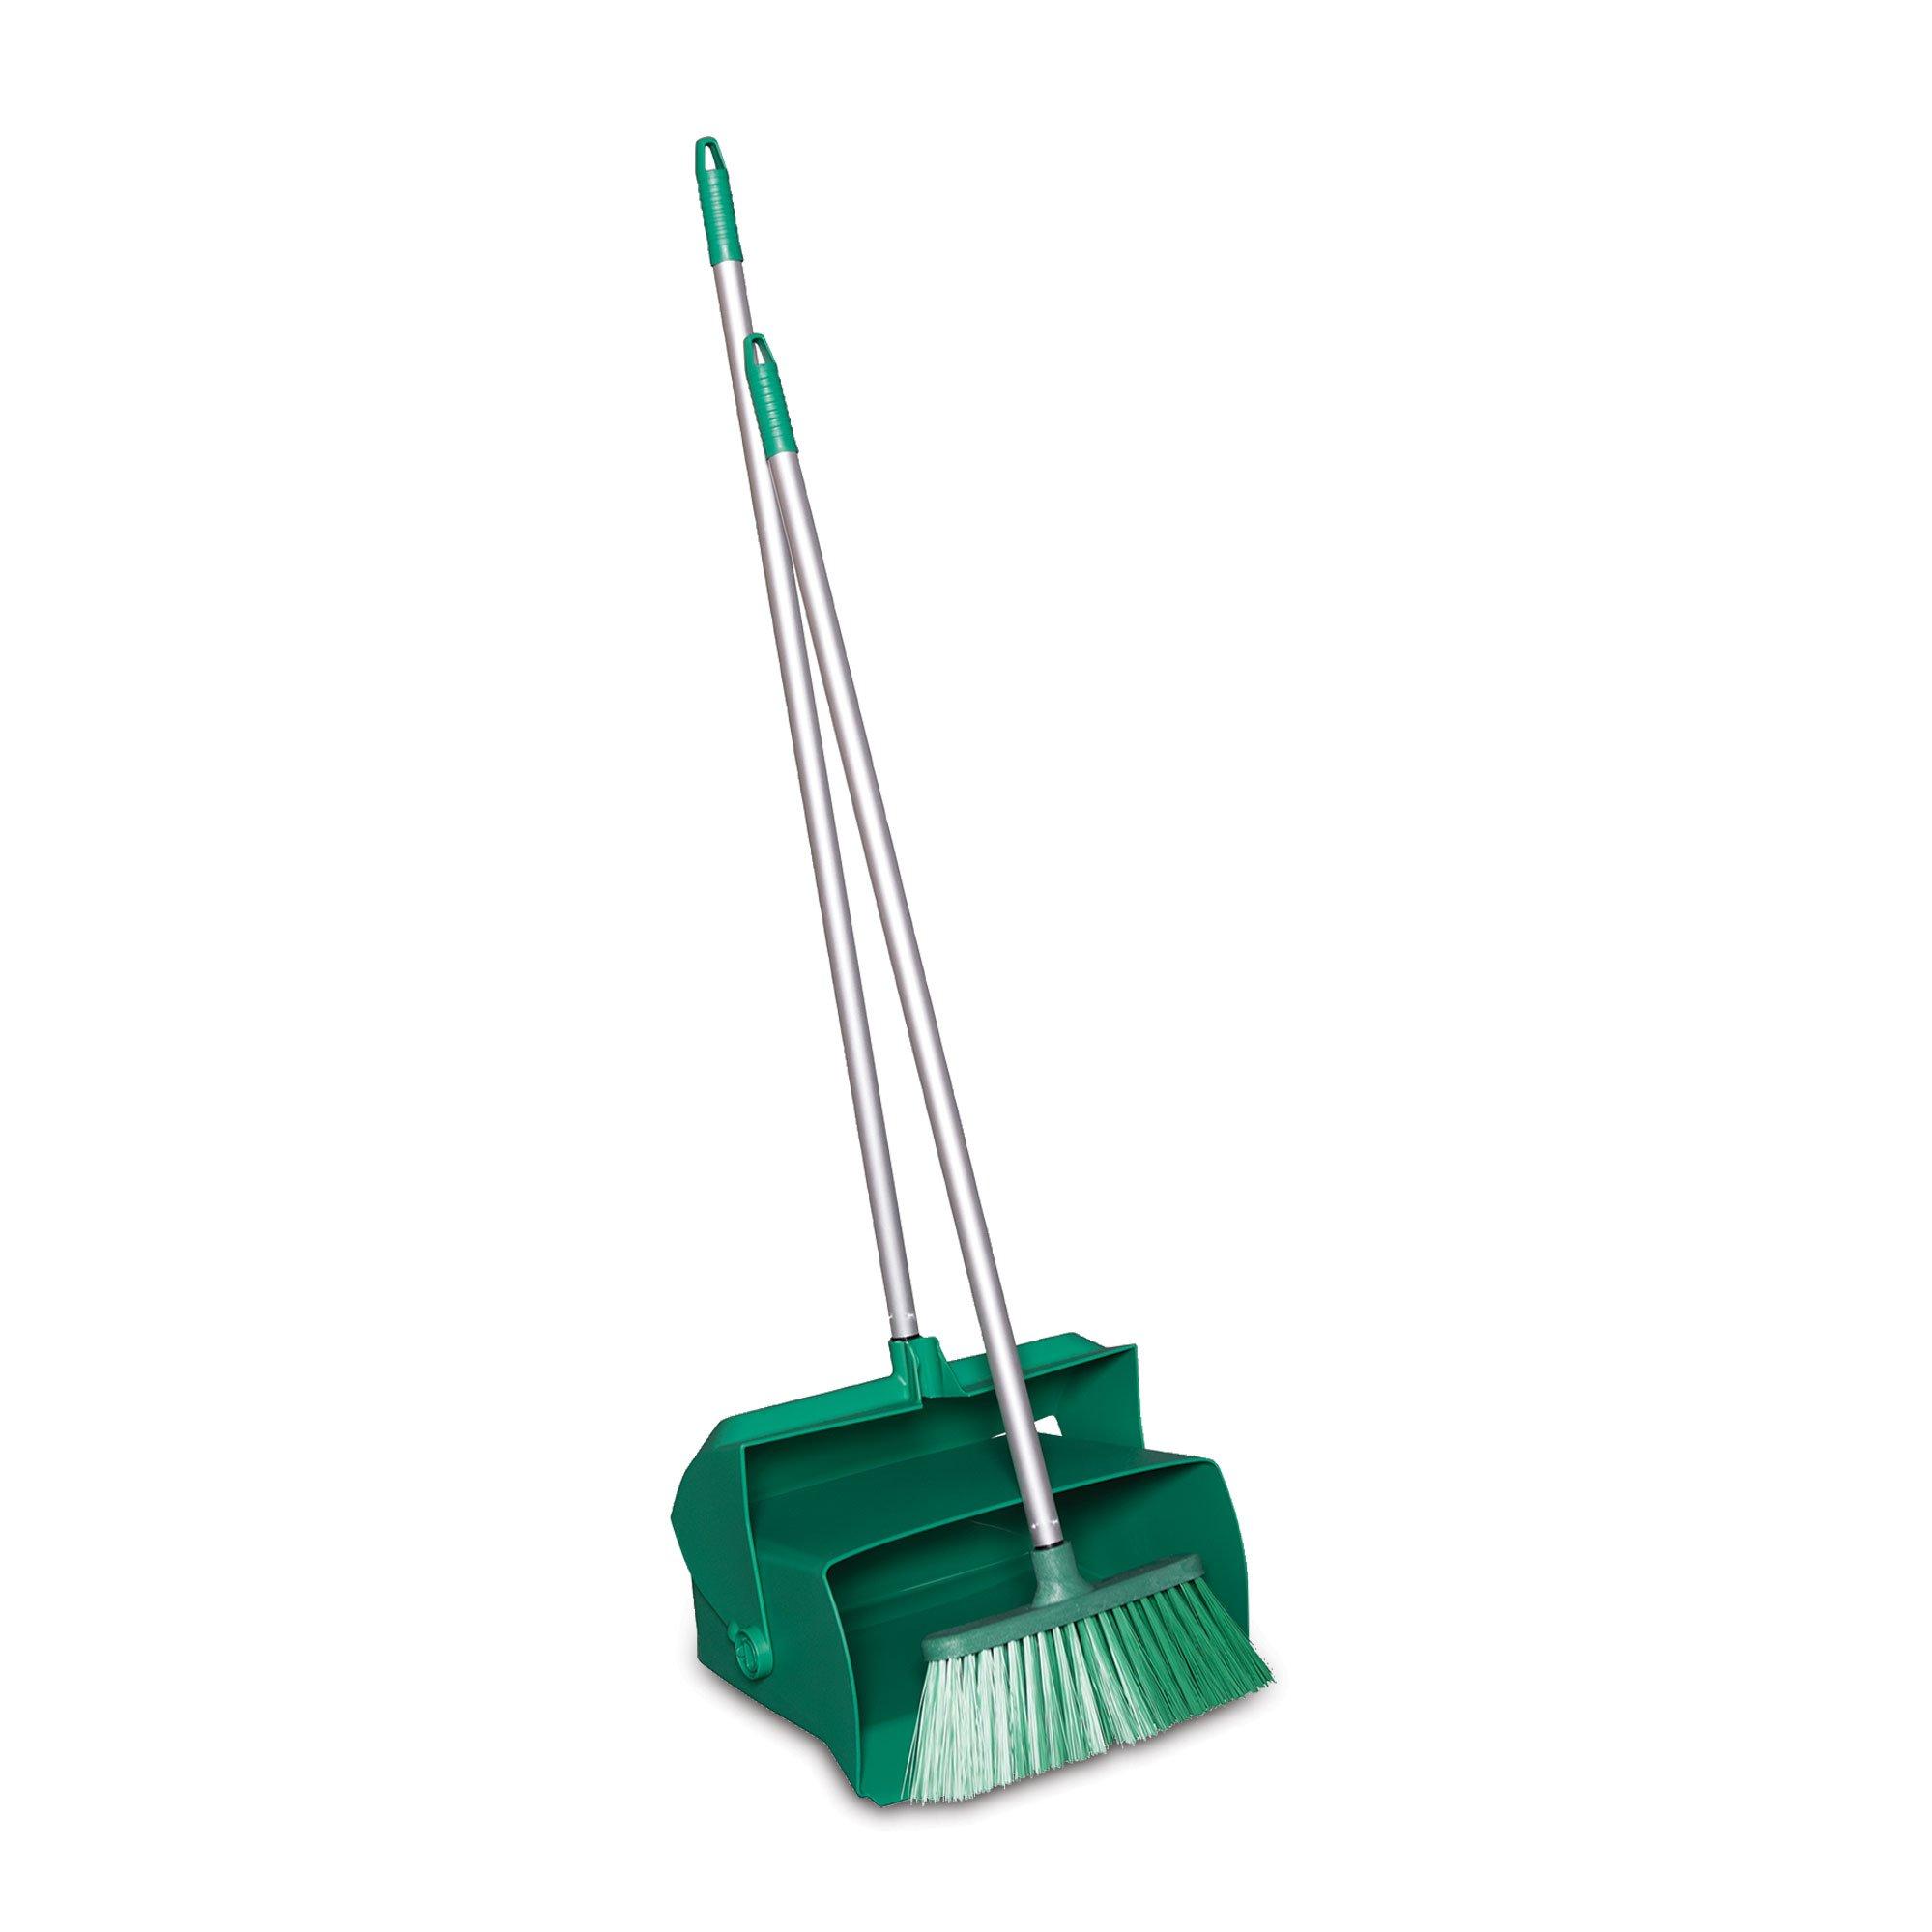 Remco 62502 Lobby Dustpan with Broom, Polypropylene/Polyester/Aluminum, 7'' X 14'' Bin, 37'' Handle, Green